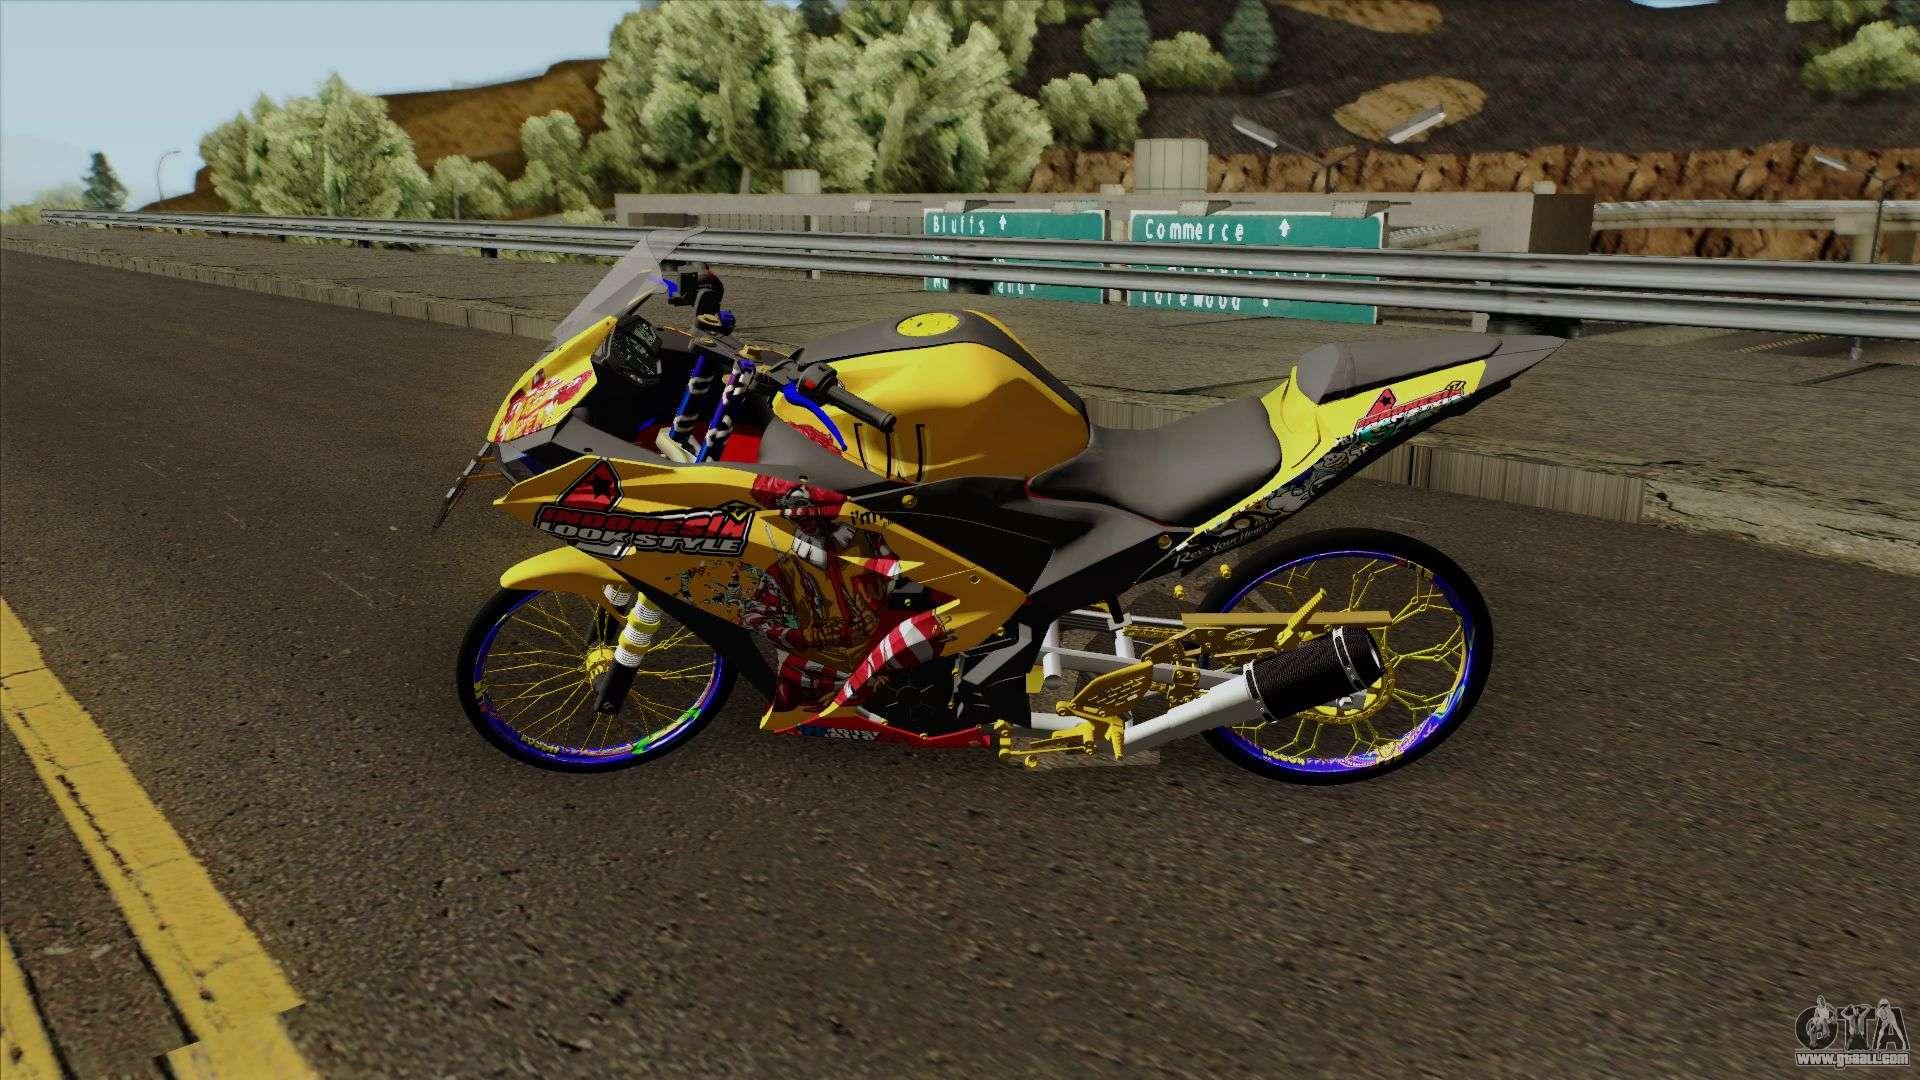 R25 Thailook For Gta San Andreas